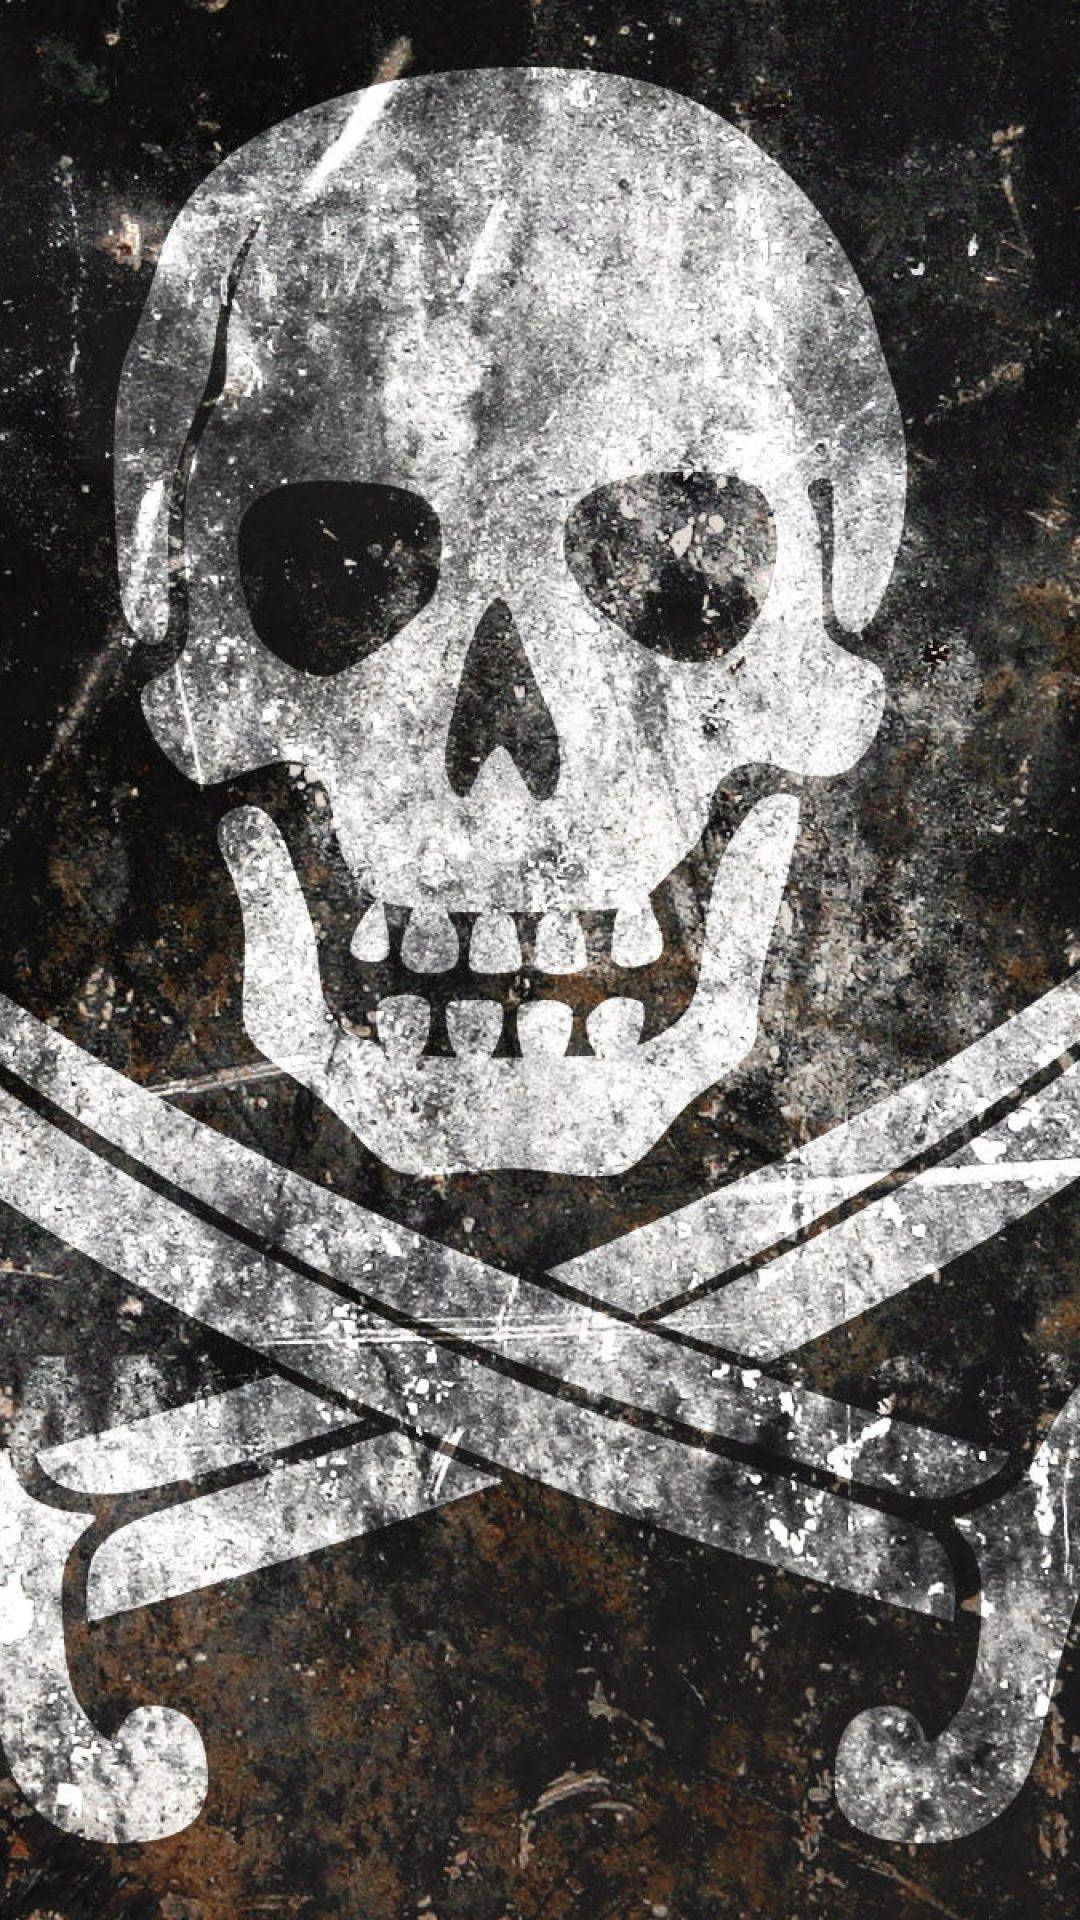 Pirate Flag Wallpaper Iphone